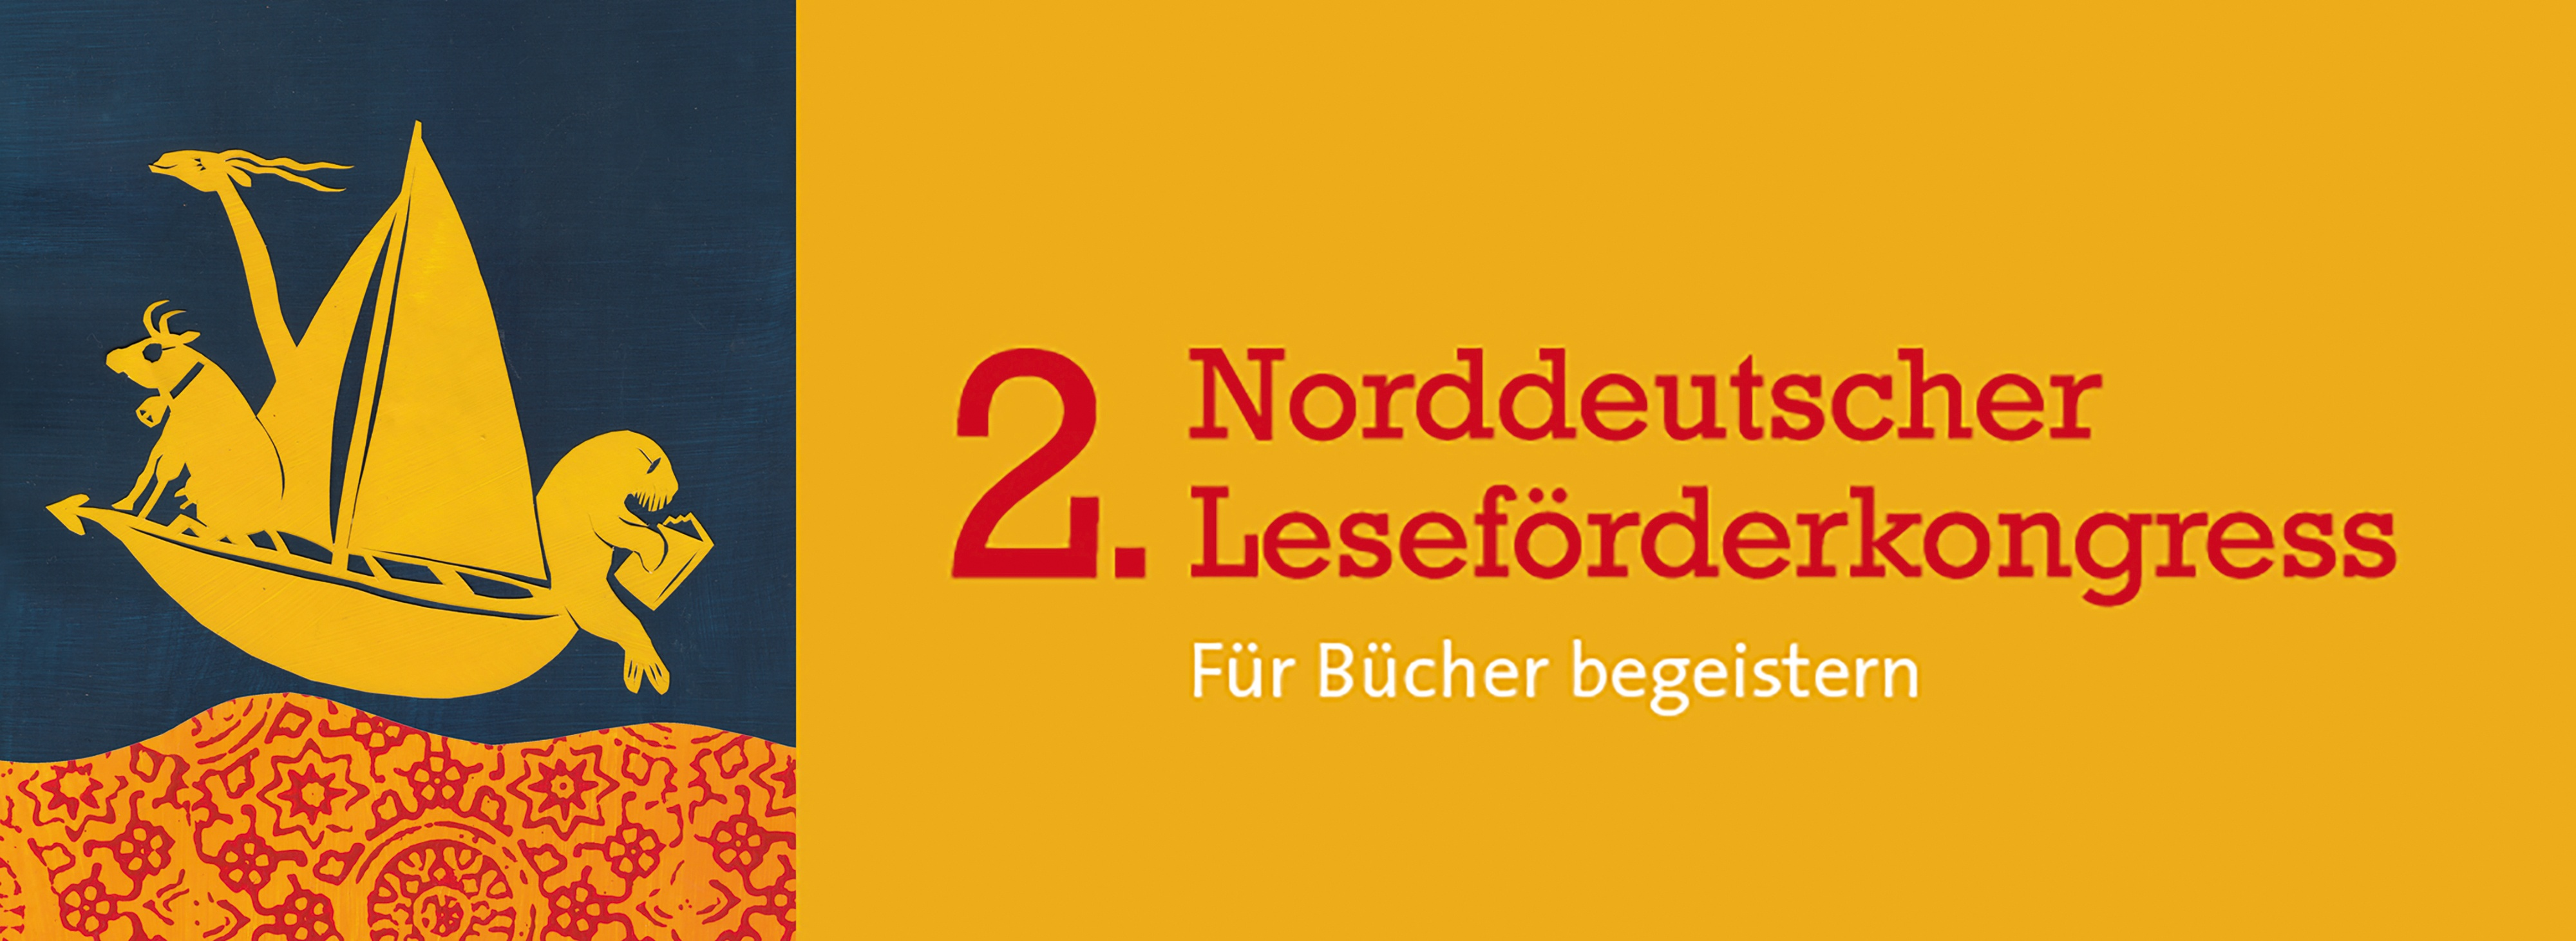 Norddeutscher Leseförderkongress 2020